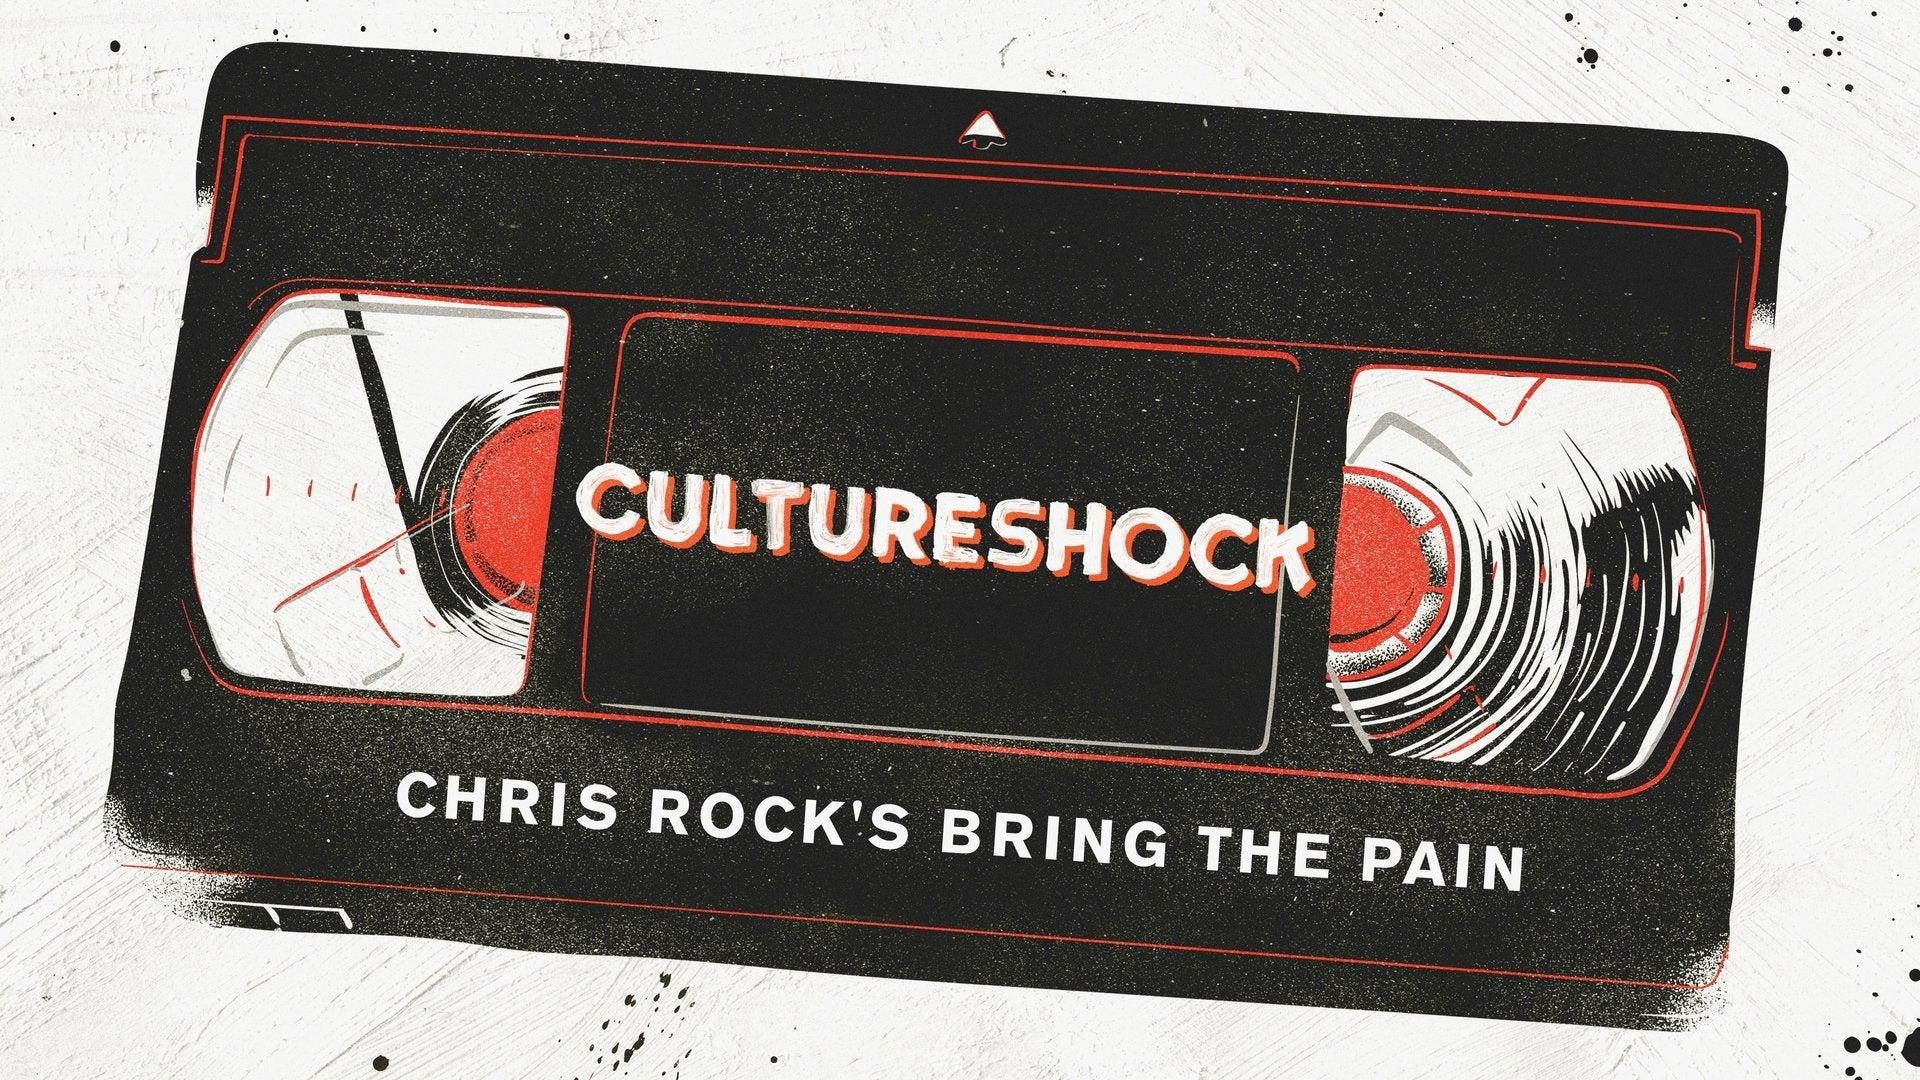 Cultureshock: Chris Rock's Bring the Pain